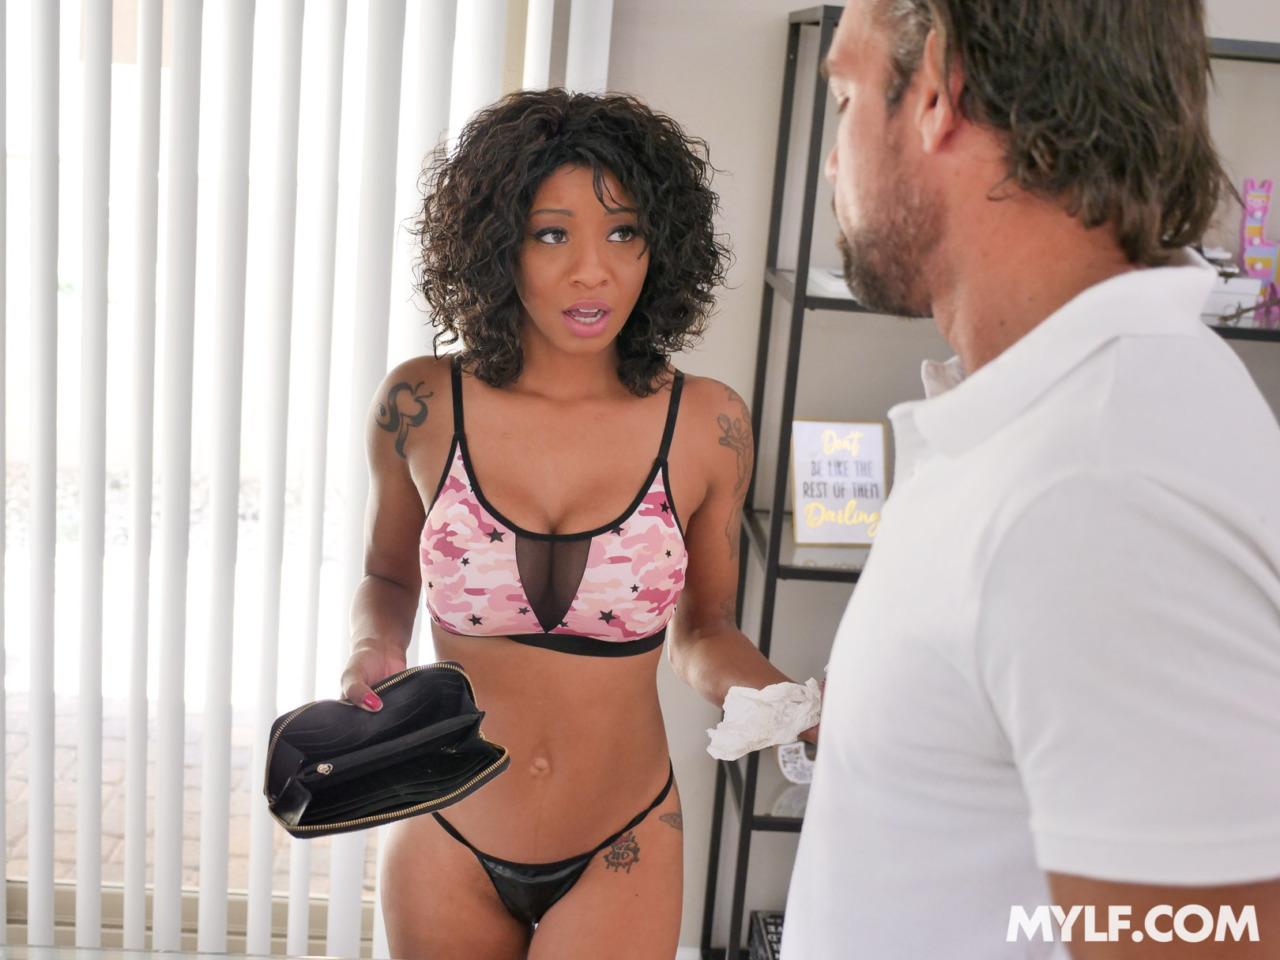 MYLF: BabeSource.com: September Reign - 6